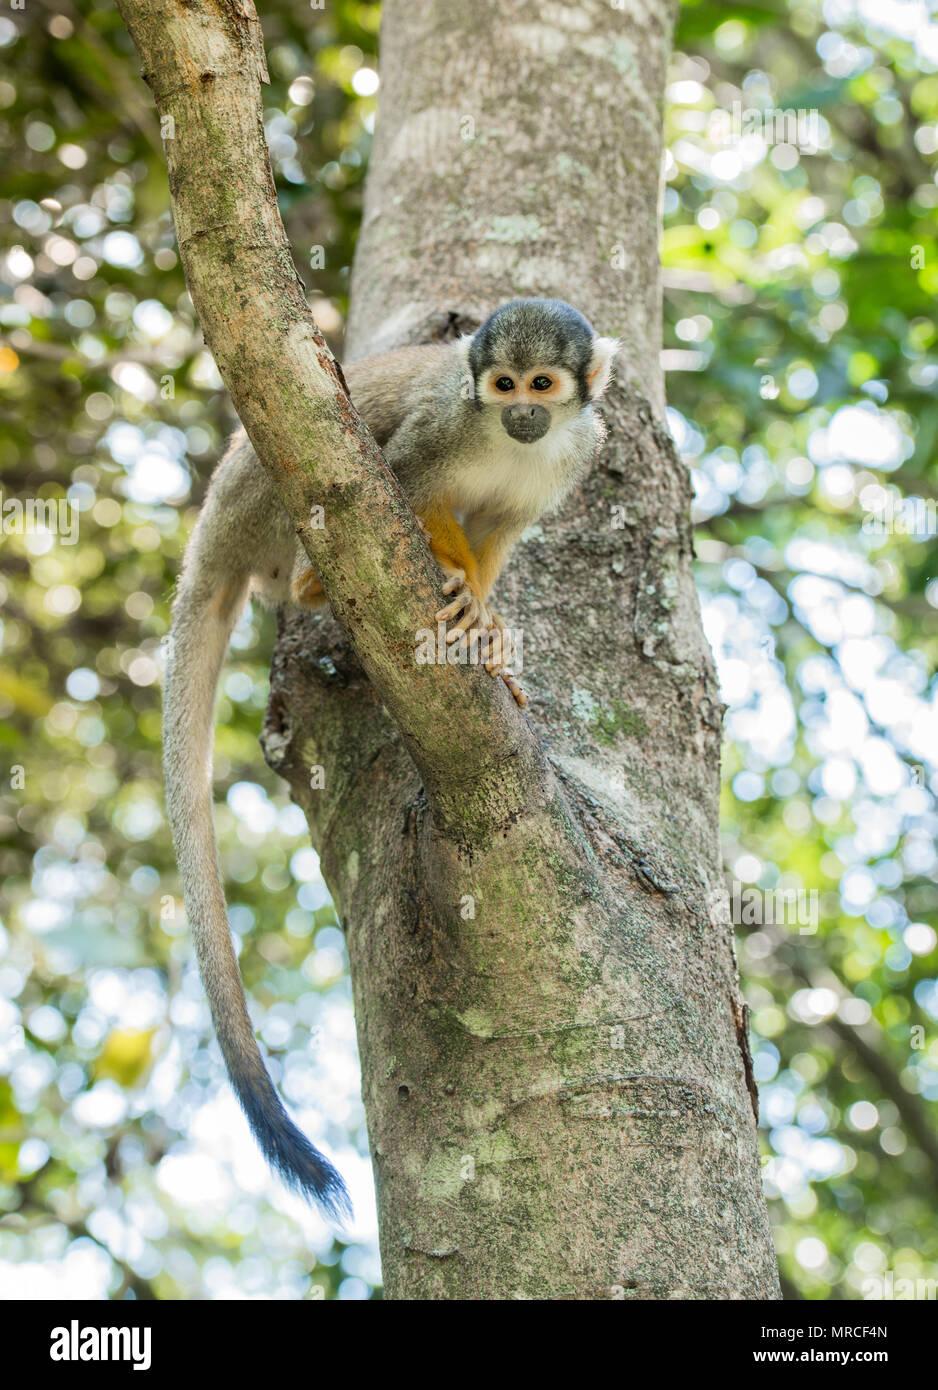 Squirrel monkeys in trees - photo#38